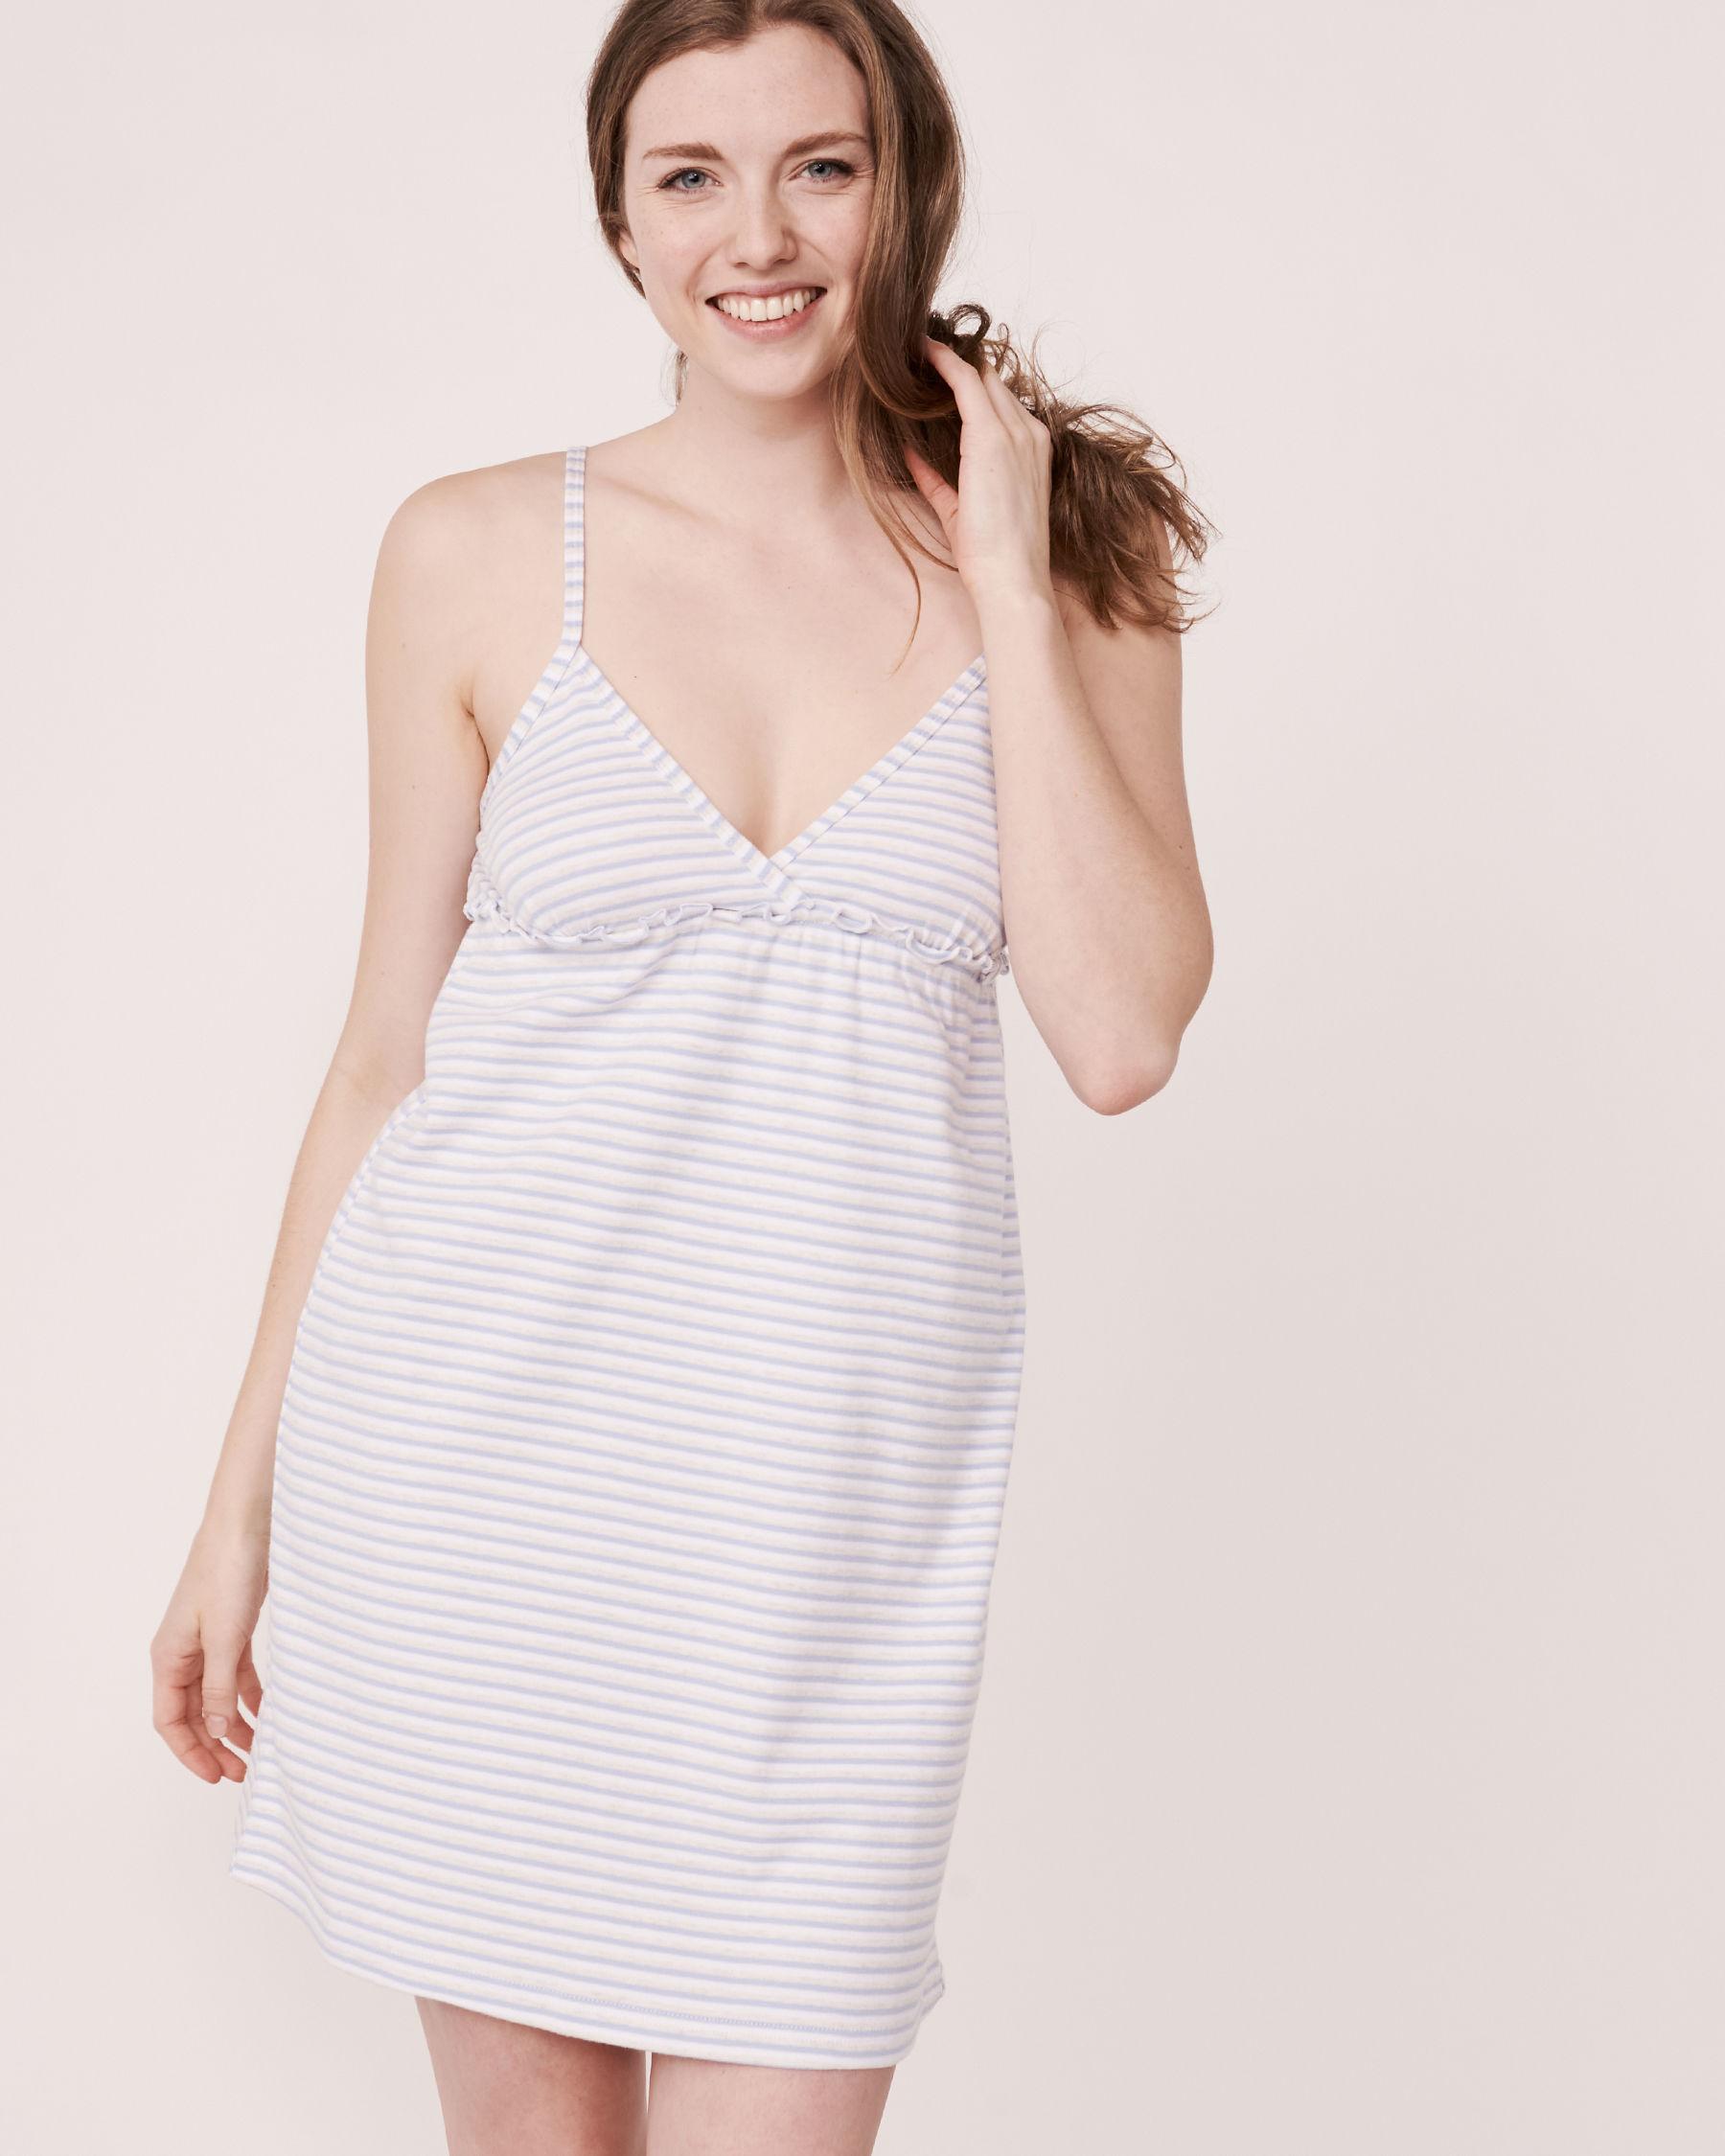 LA VIE EN ROSE Organic Cotton Thin Straps Nightie Blue and white stripes 40500003 - View1